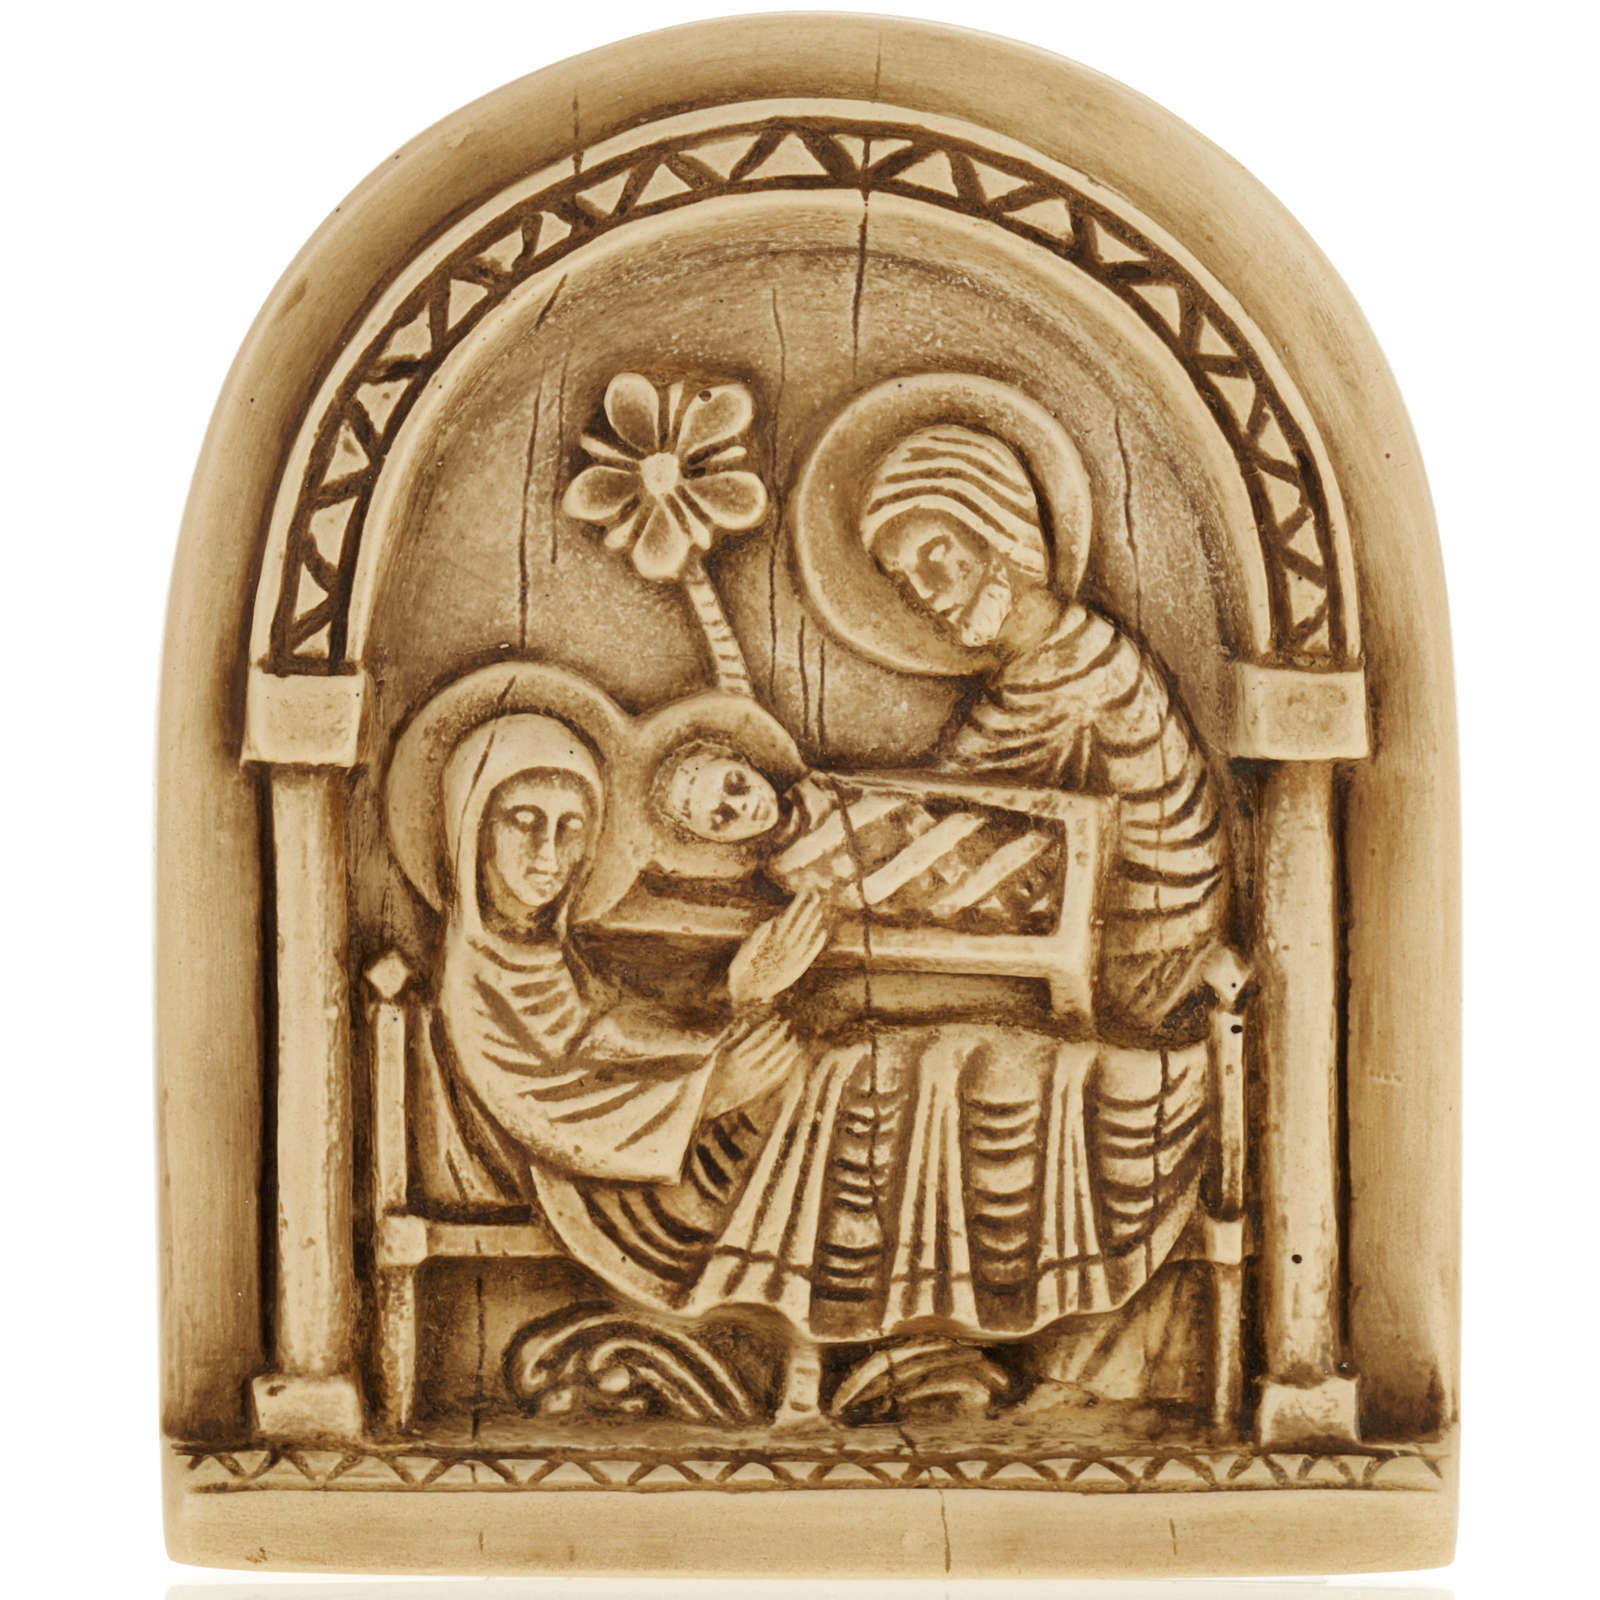 Nativity scene bas relief in stone, Bethlehem monastery 4